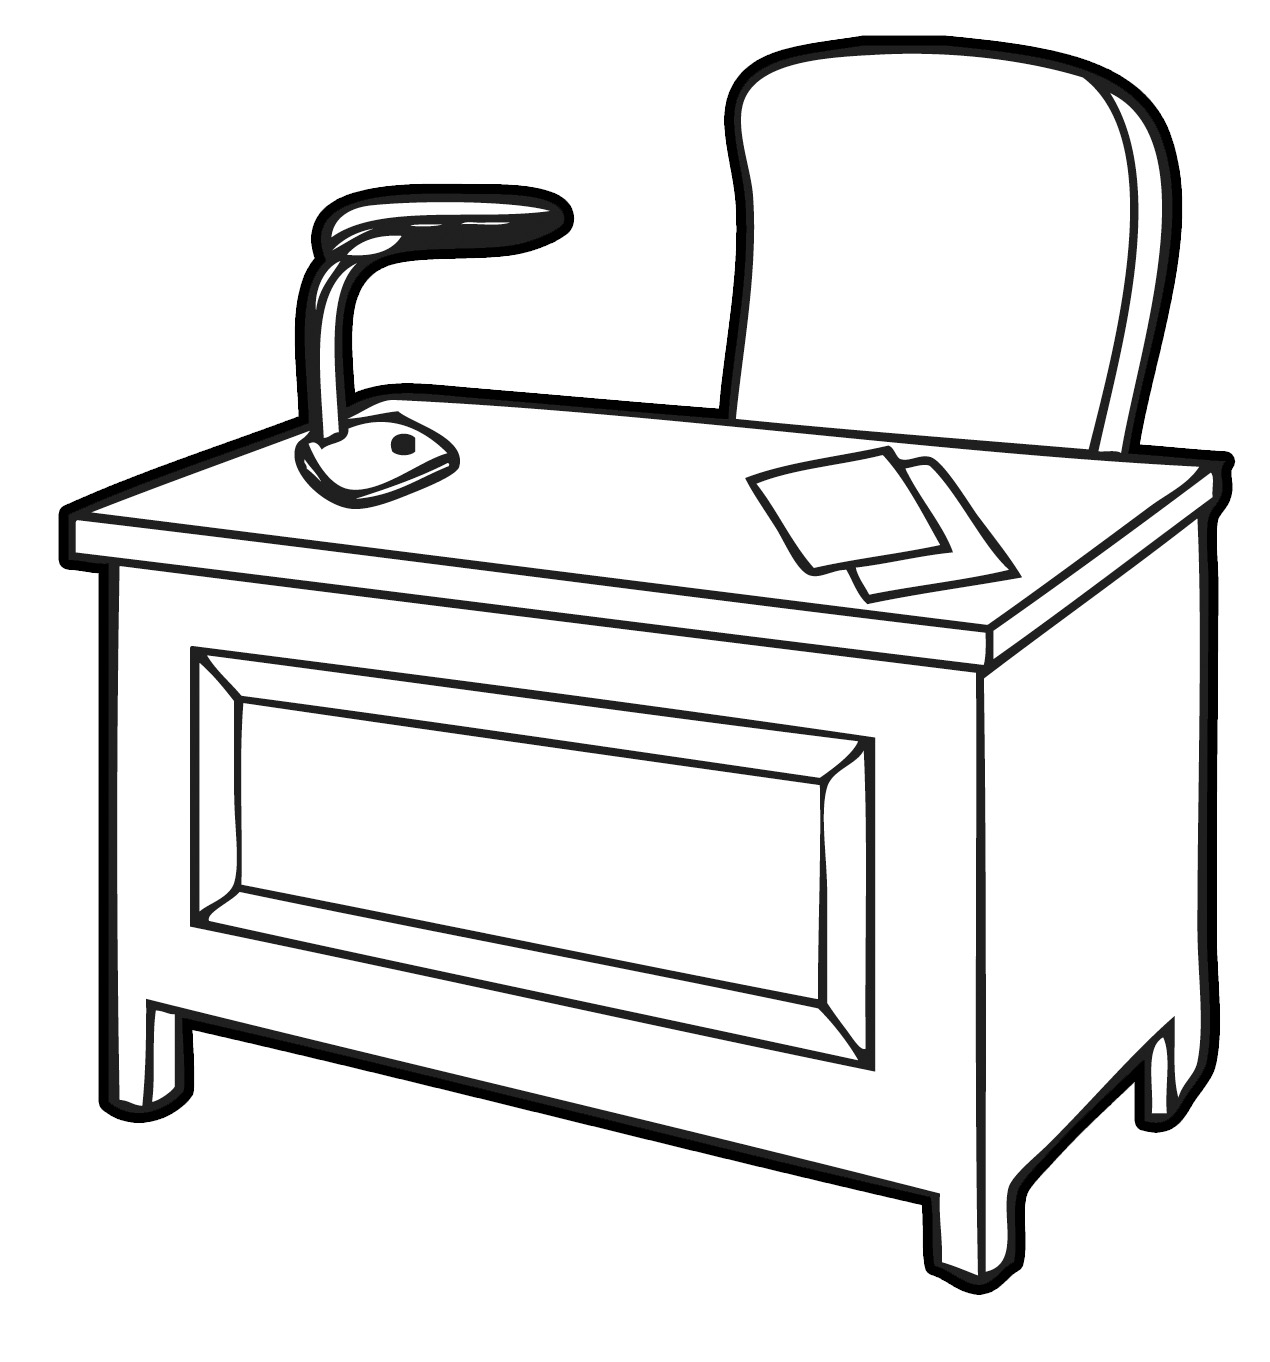 Free Bean Cliparts Desk Download Free Clip Art Free Clip